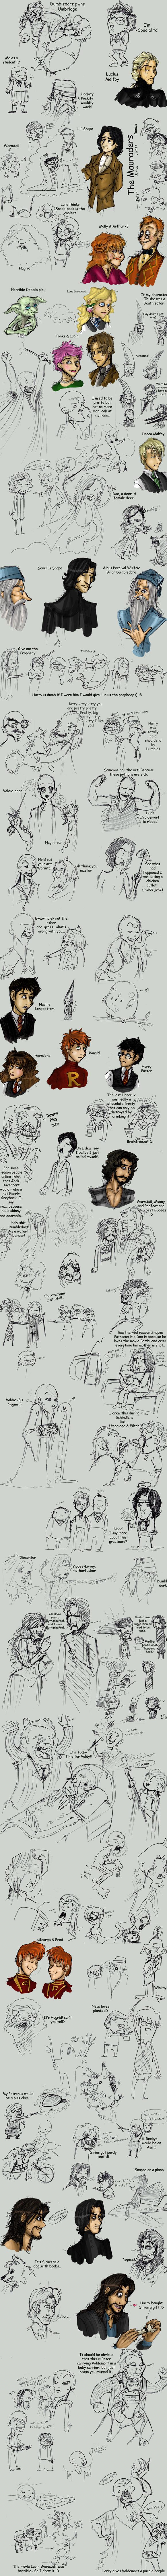 Harry Potter Mondo Sketch Dump by OhSadface